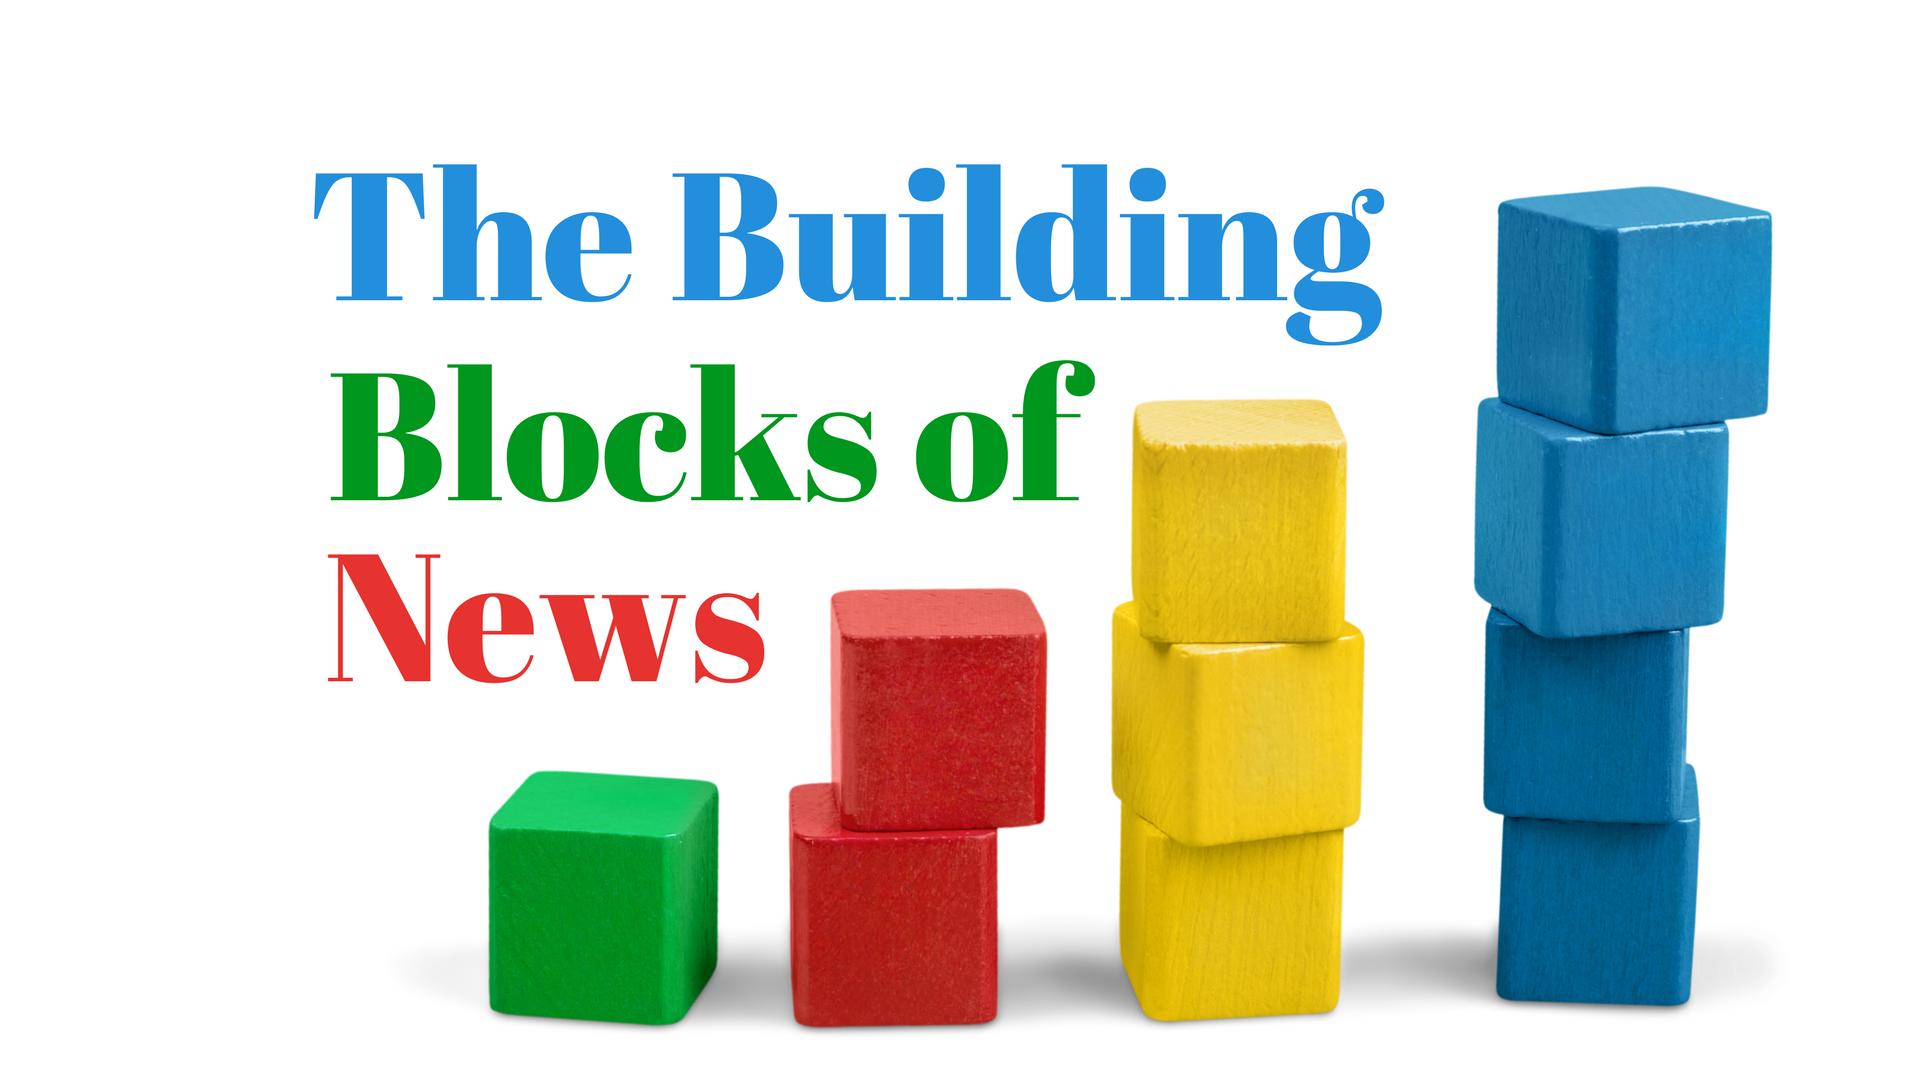 News Sense: The Building Blocks of News - Poynter